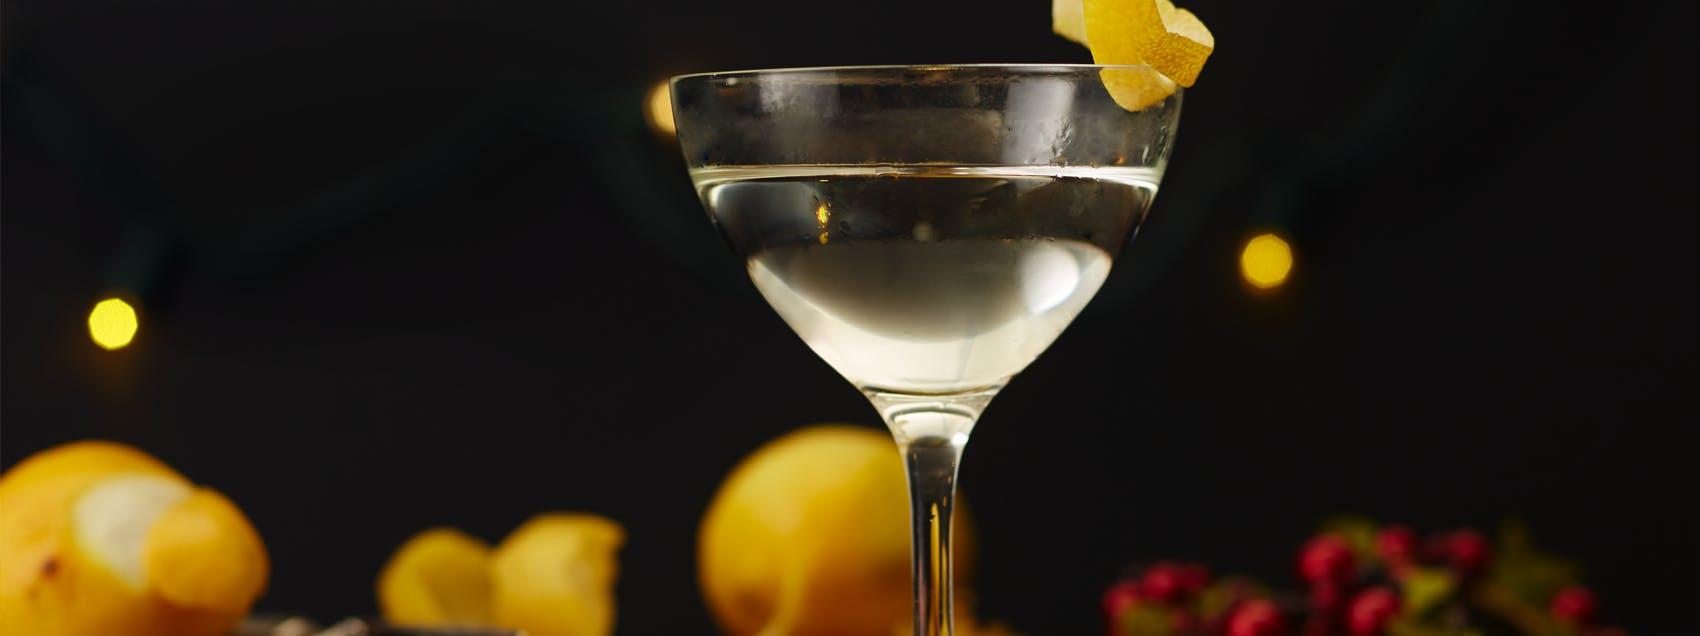 Ketel One Ultimate Martini